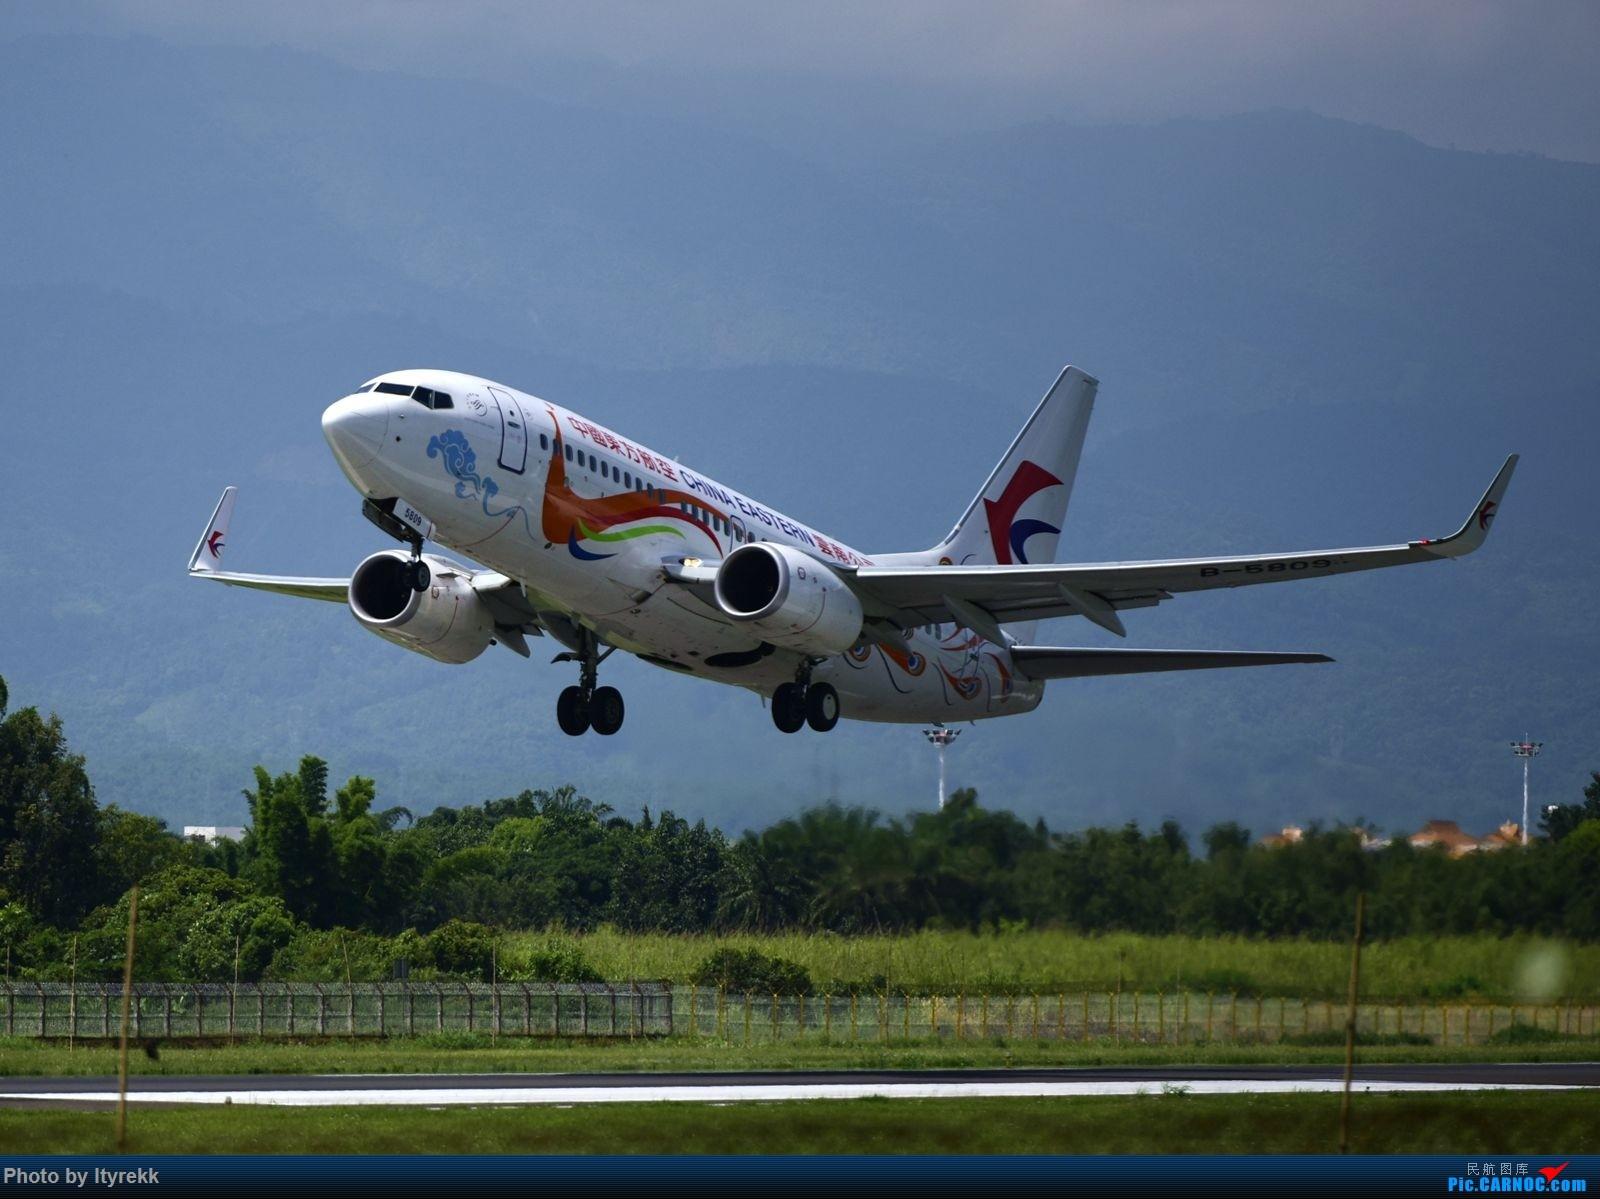 Re:[原创]怀念暑假时飞友们在一起拍机的日子 BOEING 737-700 B-5809 中国芒市机场